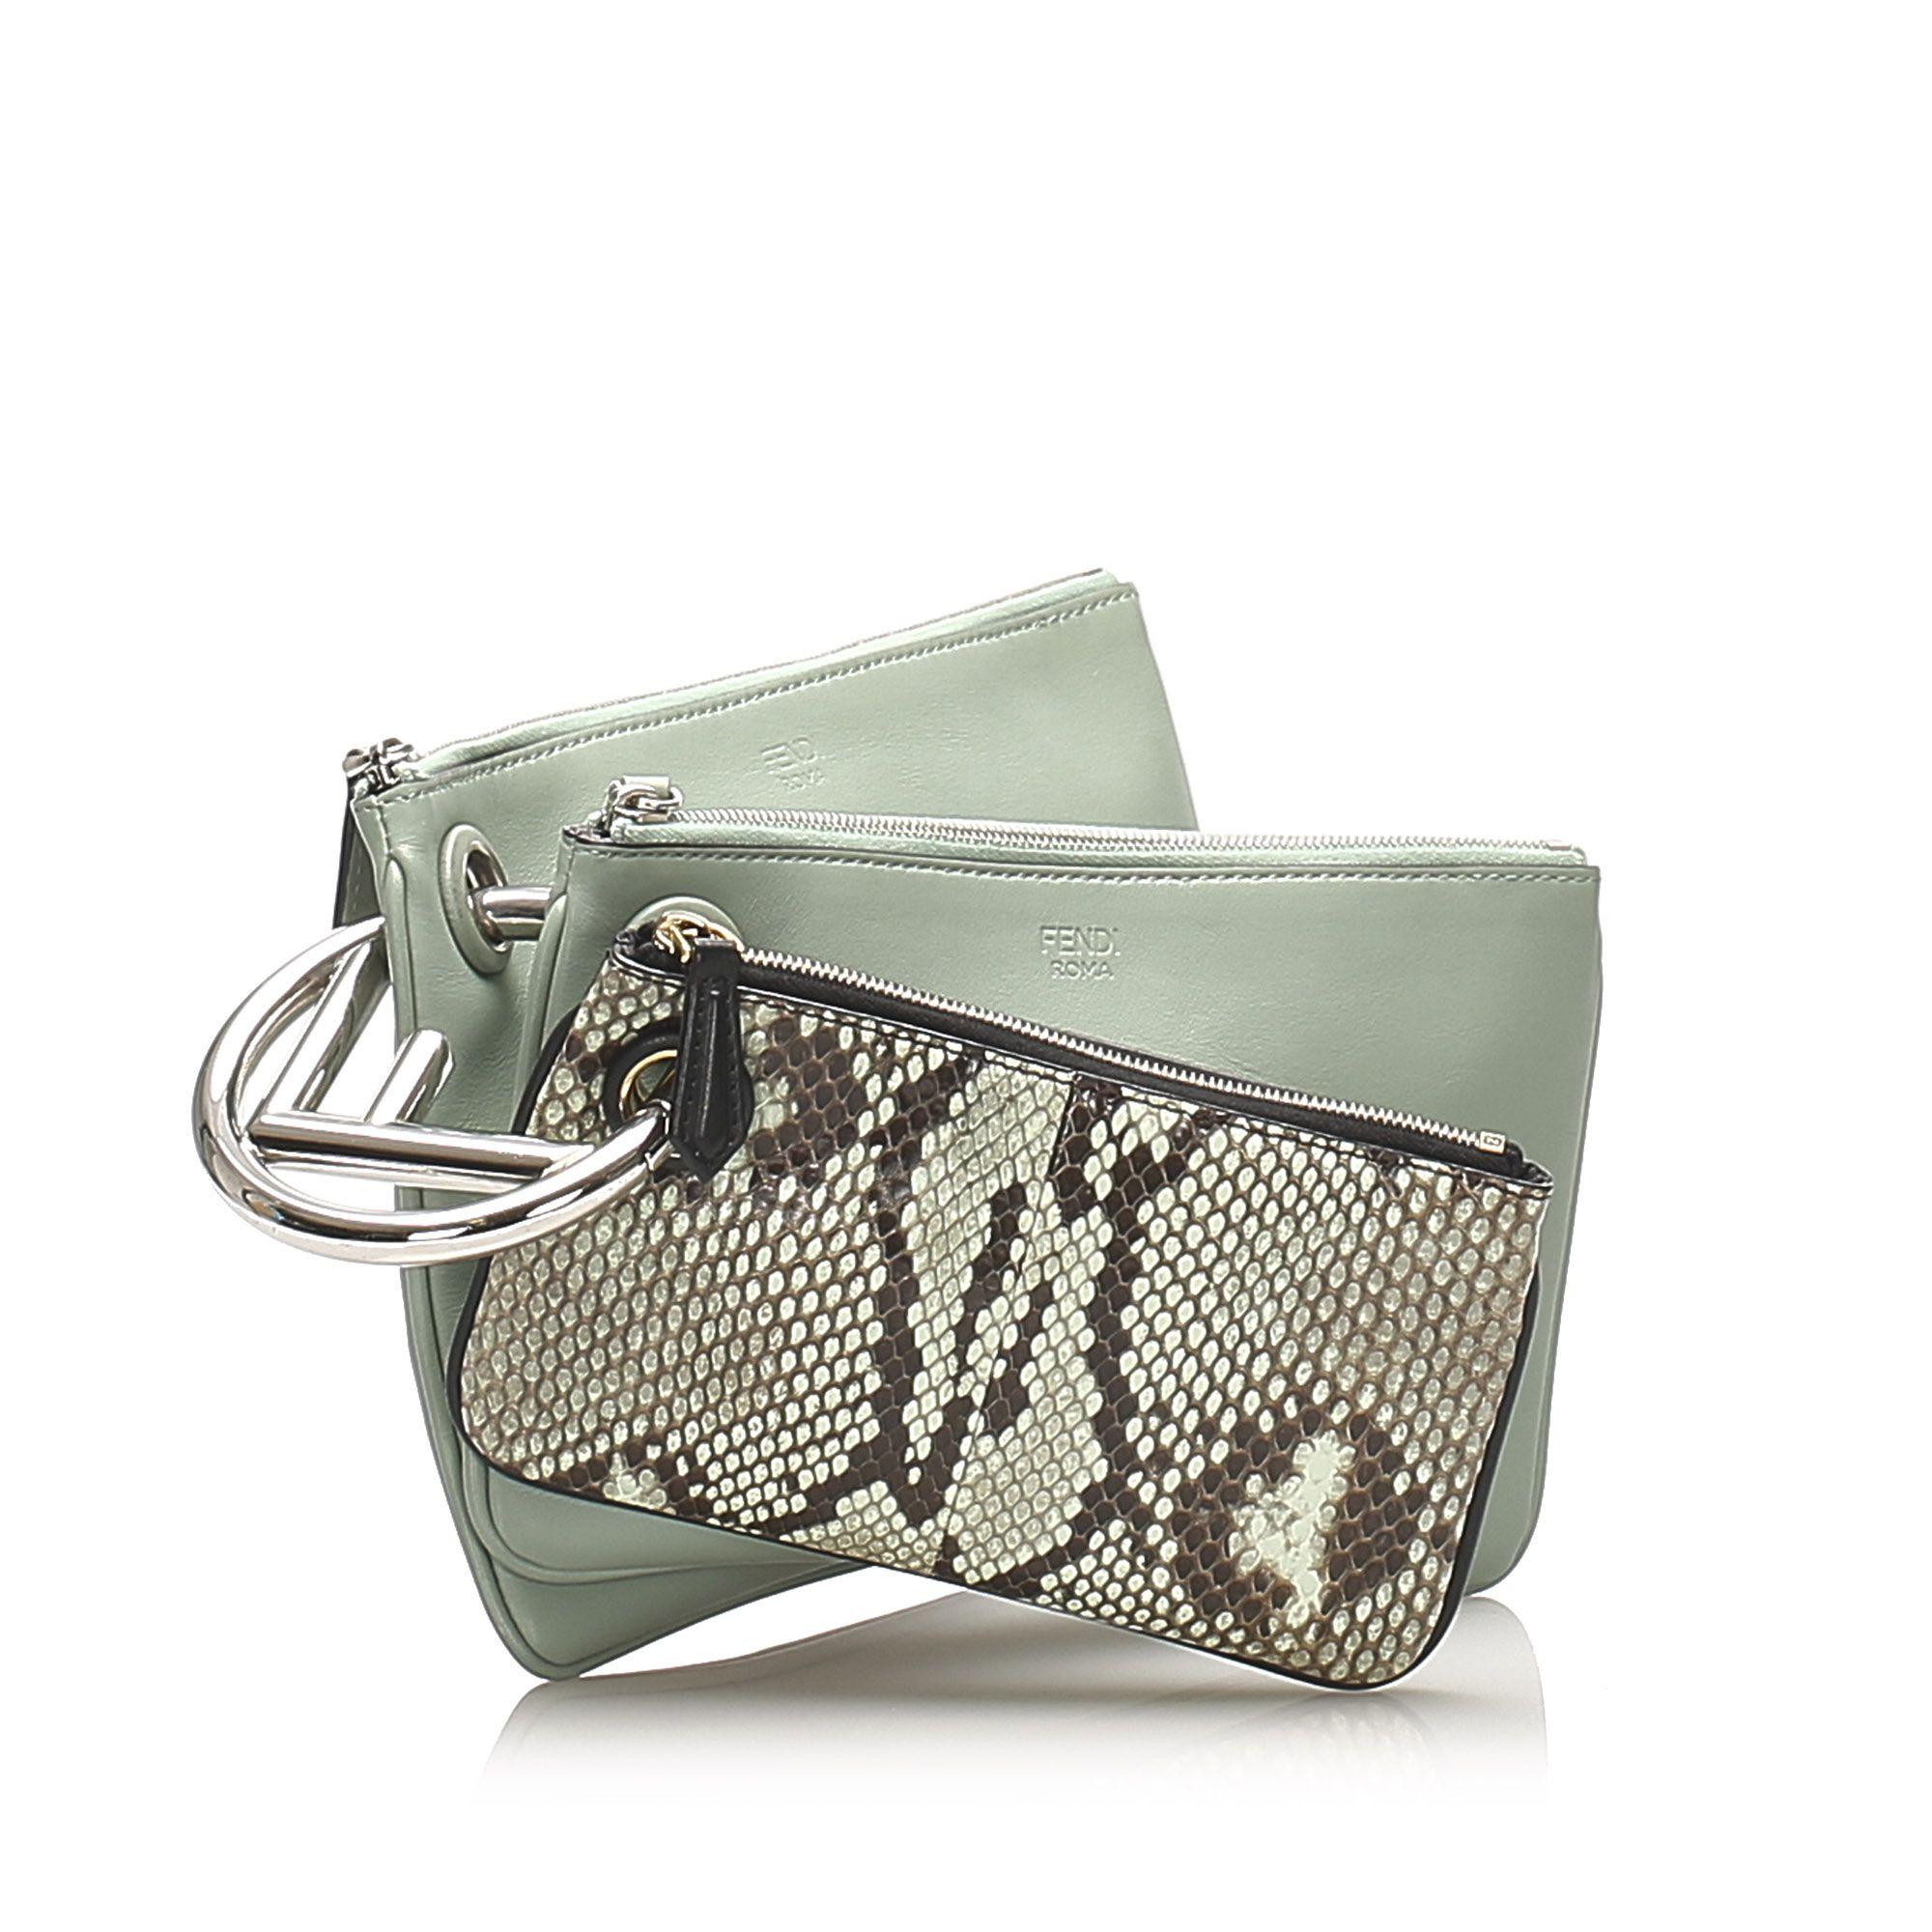 Vintage Fendi Triplette Leather Clutch Bag Green